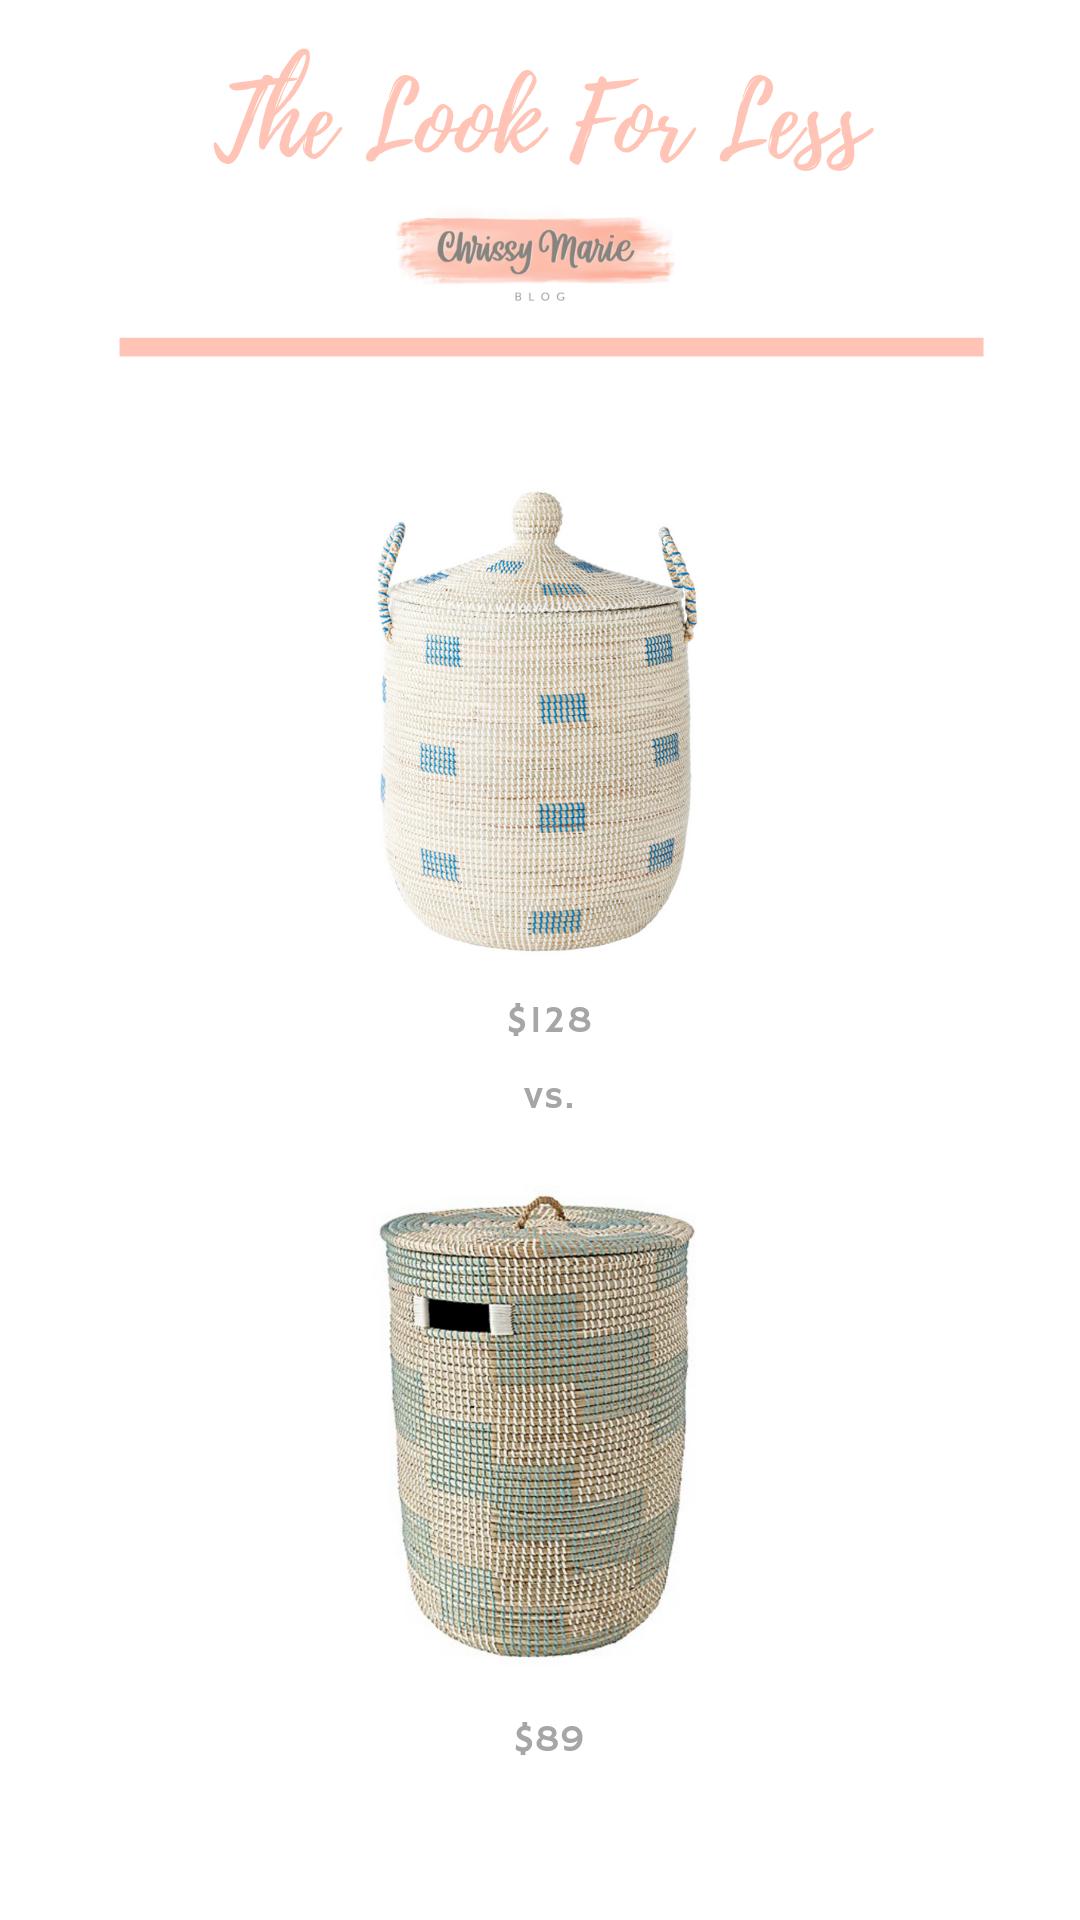 La Jolla Basket And Woven Hamper... Save or Splurge?